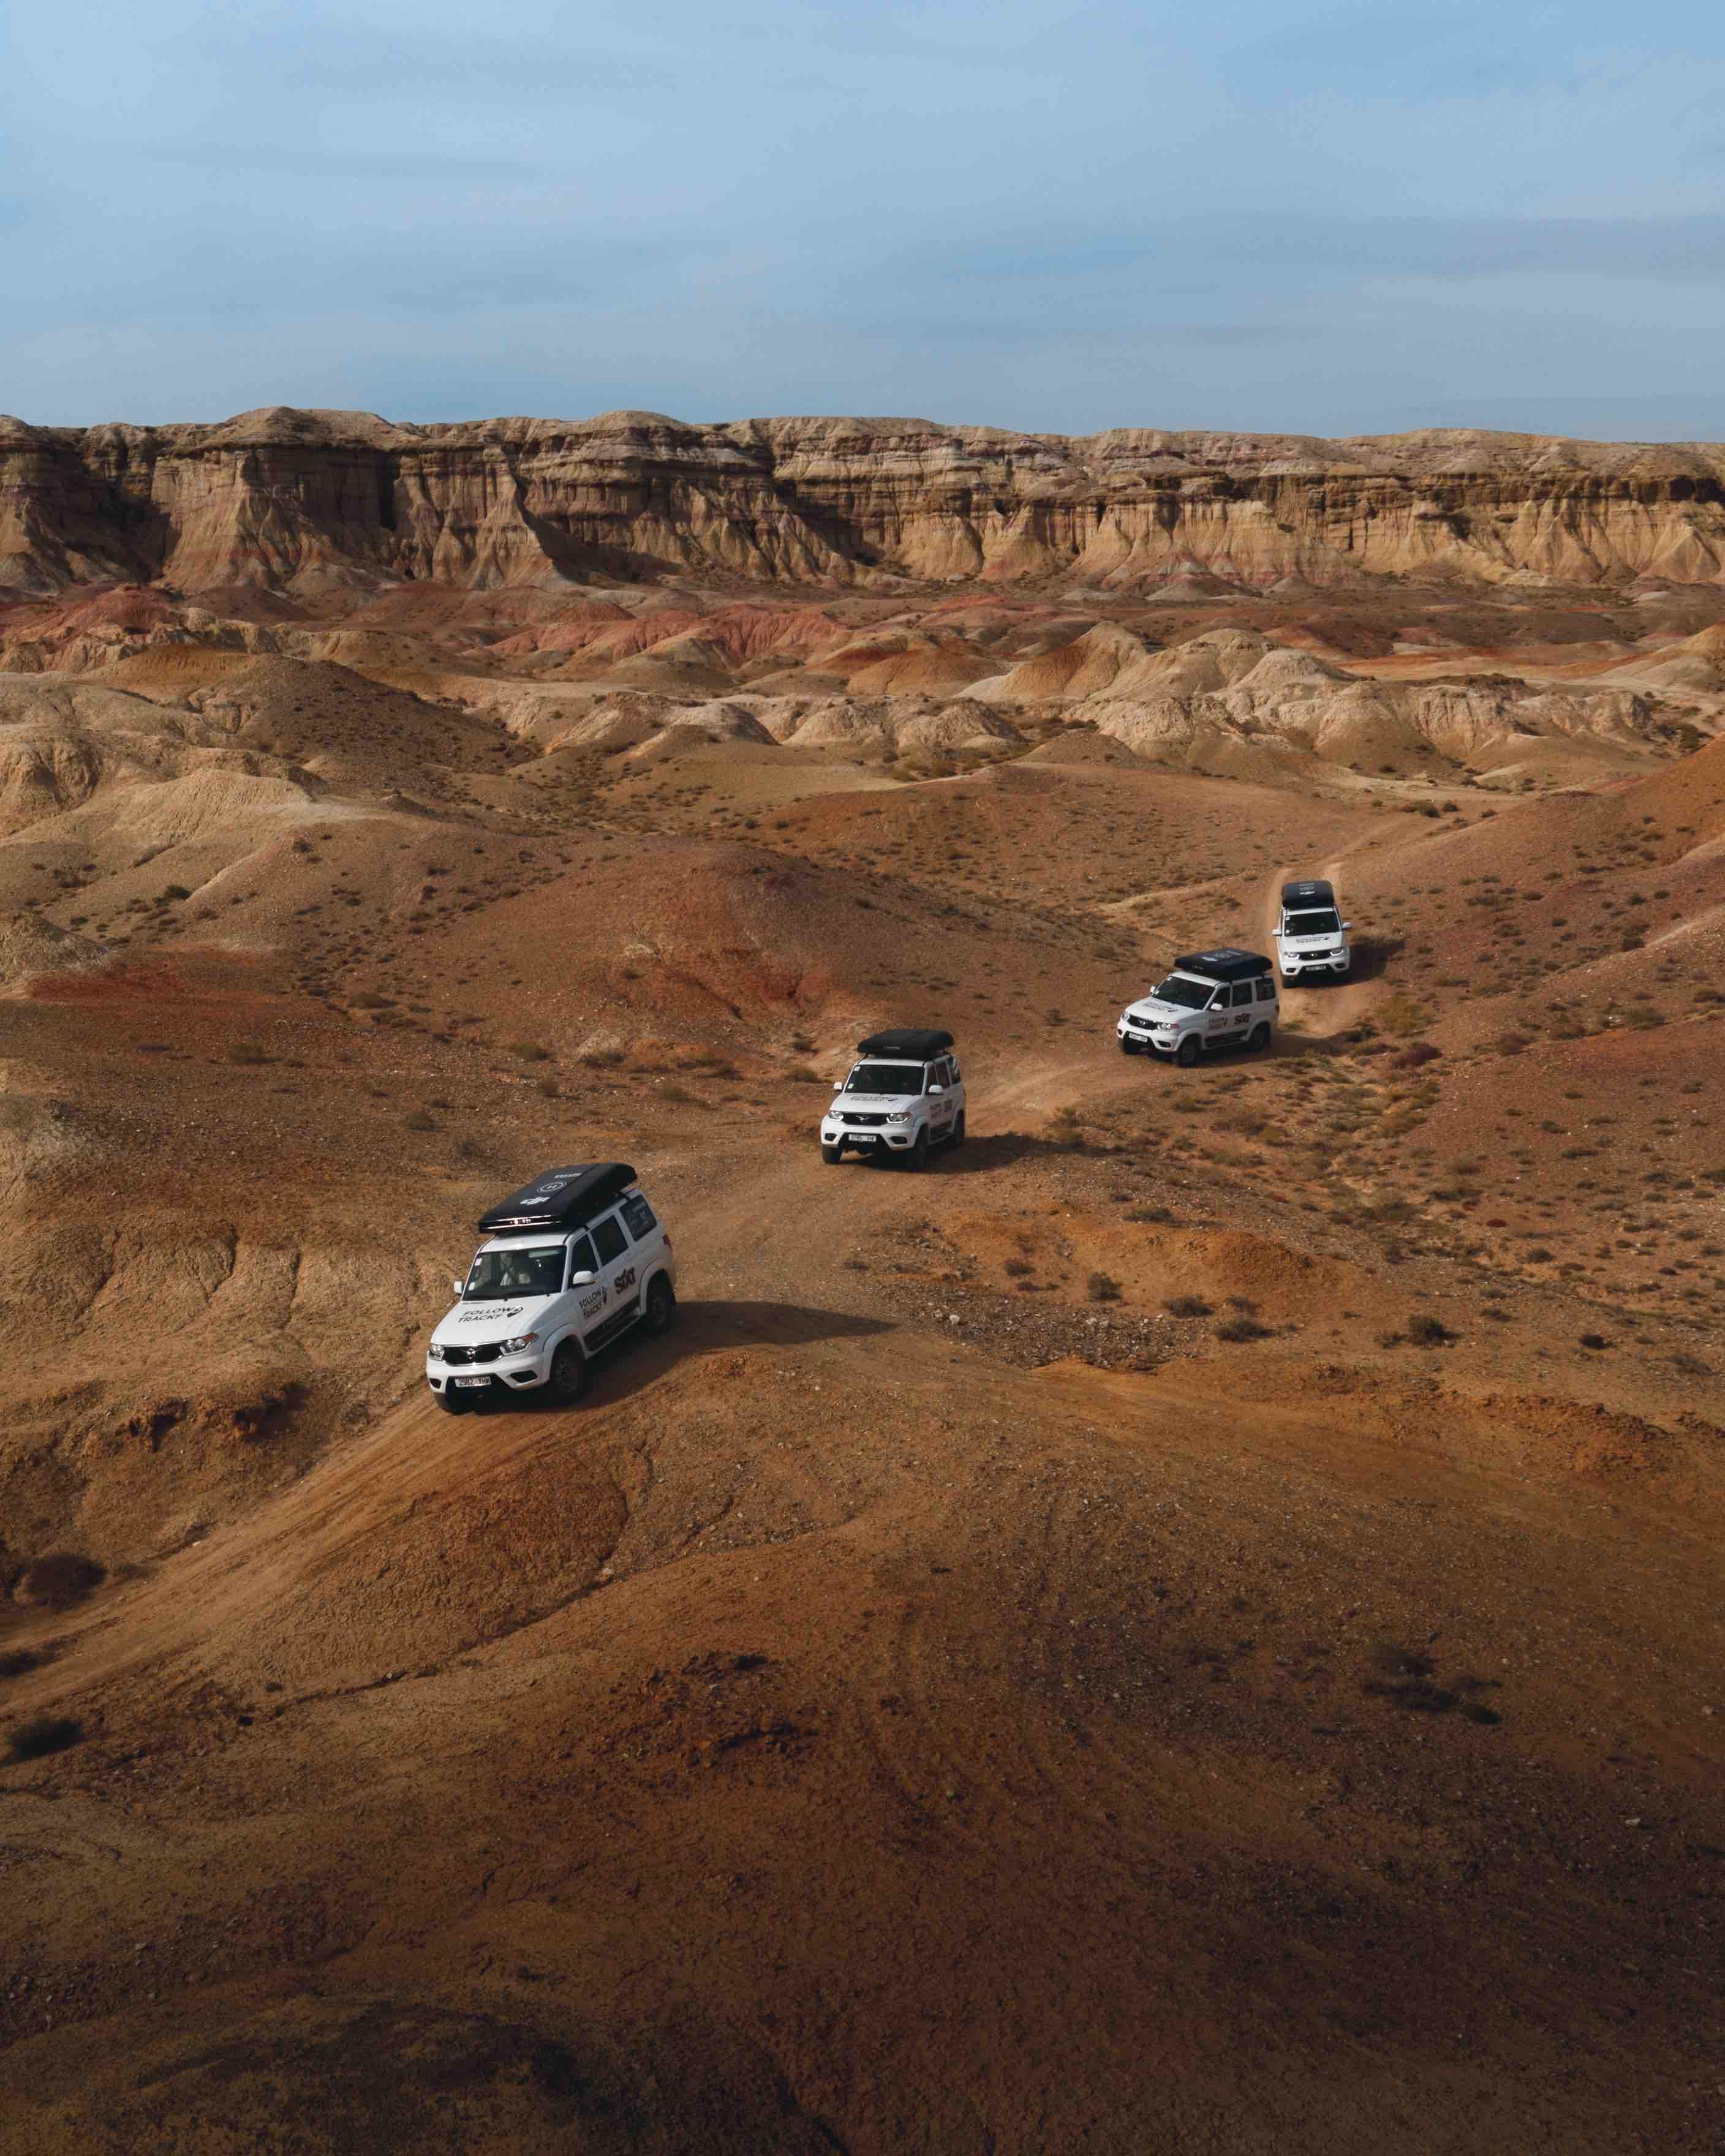 Mongolia Gobi Convoy driving